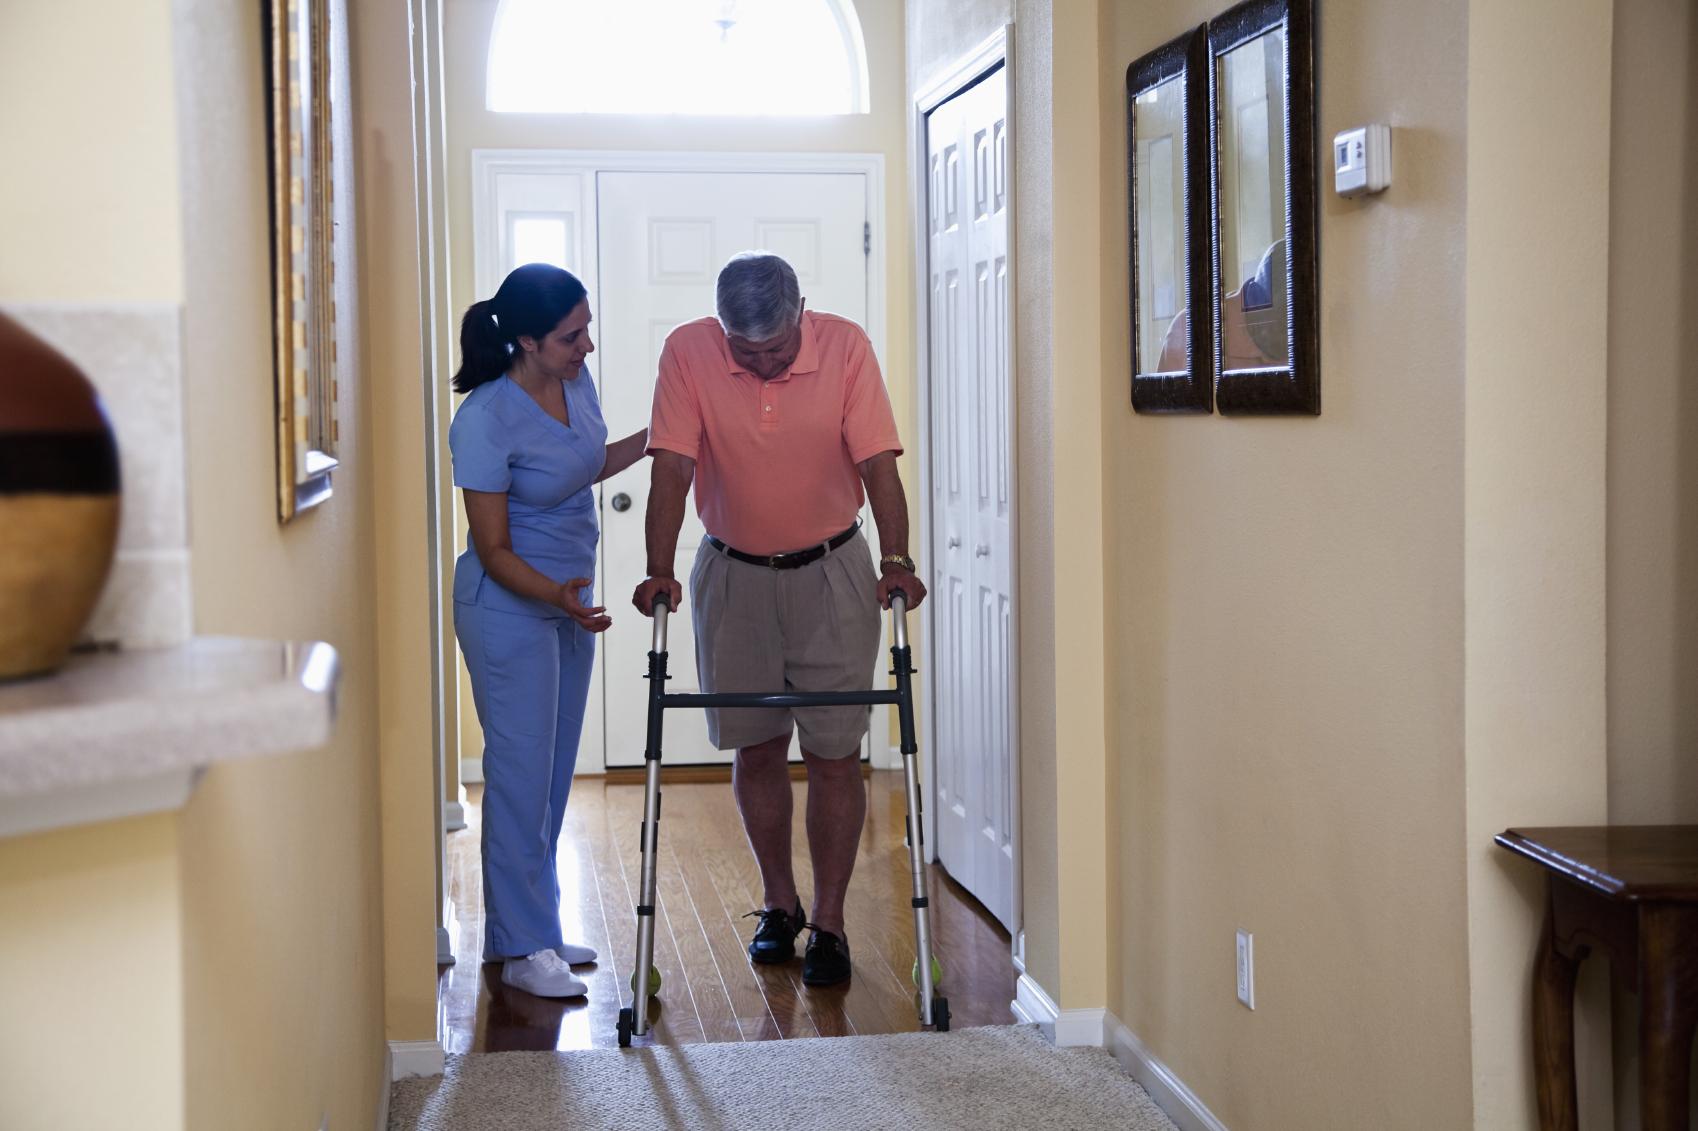 Home healthcare - Hispanic nurse at home of senior man (60s) using walker.